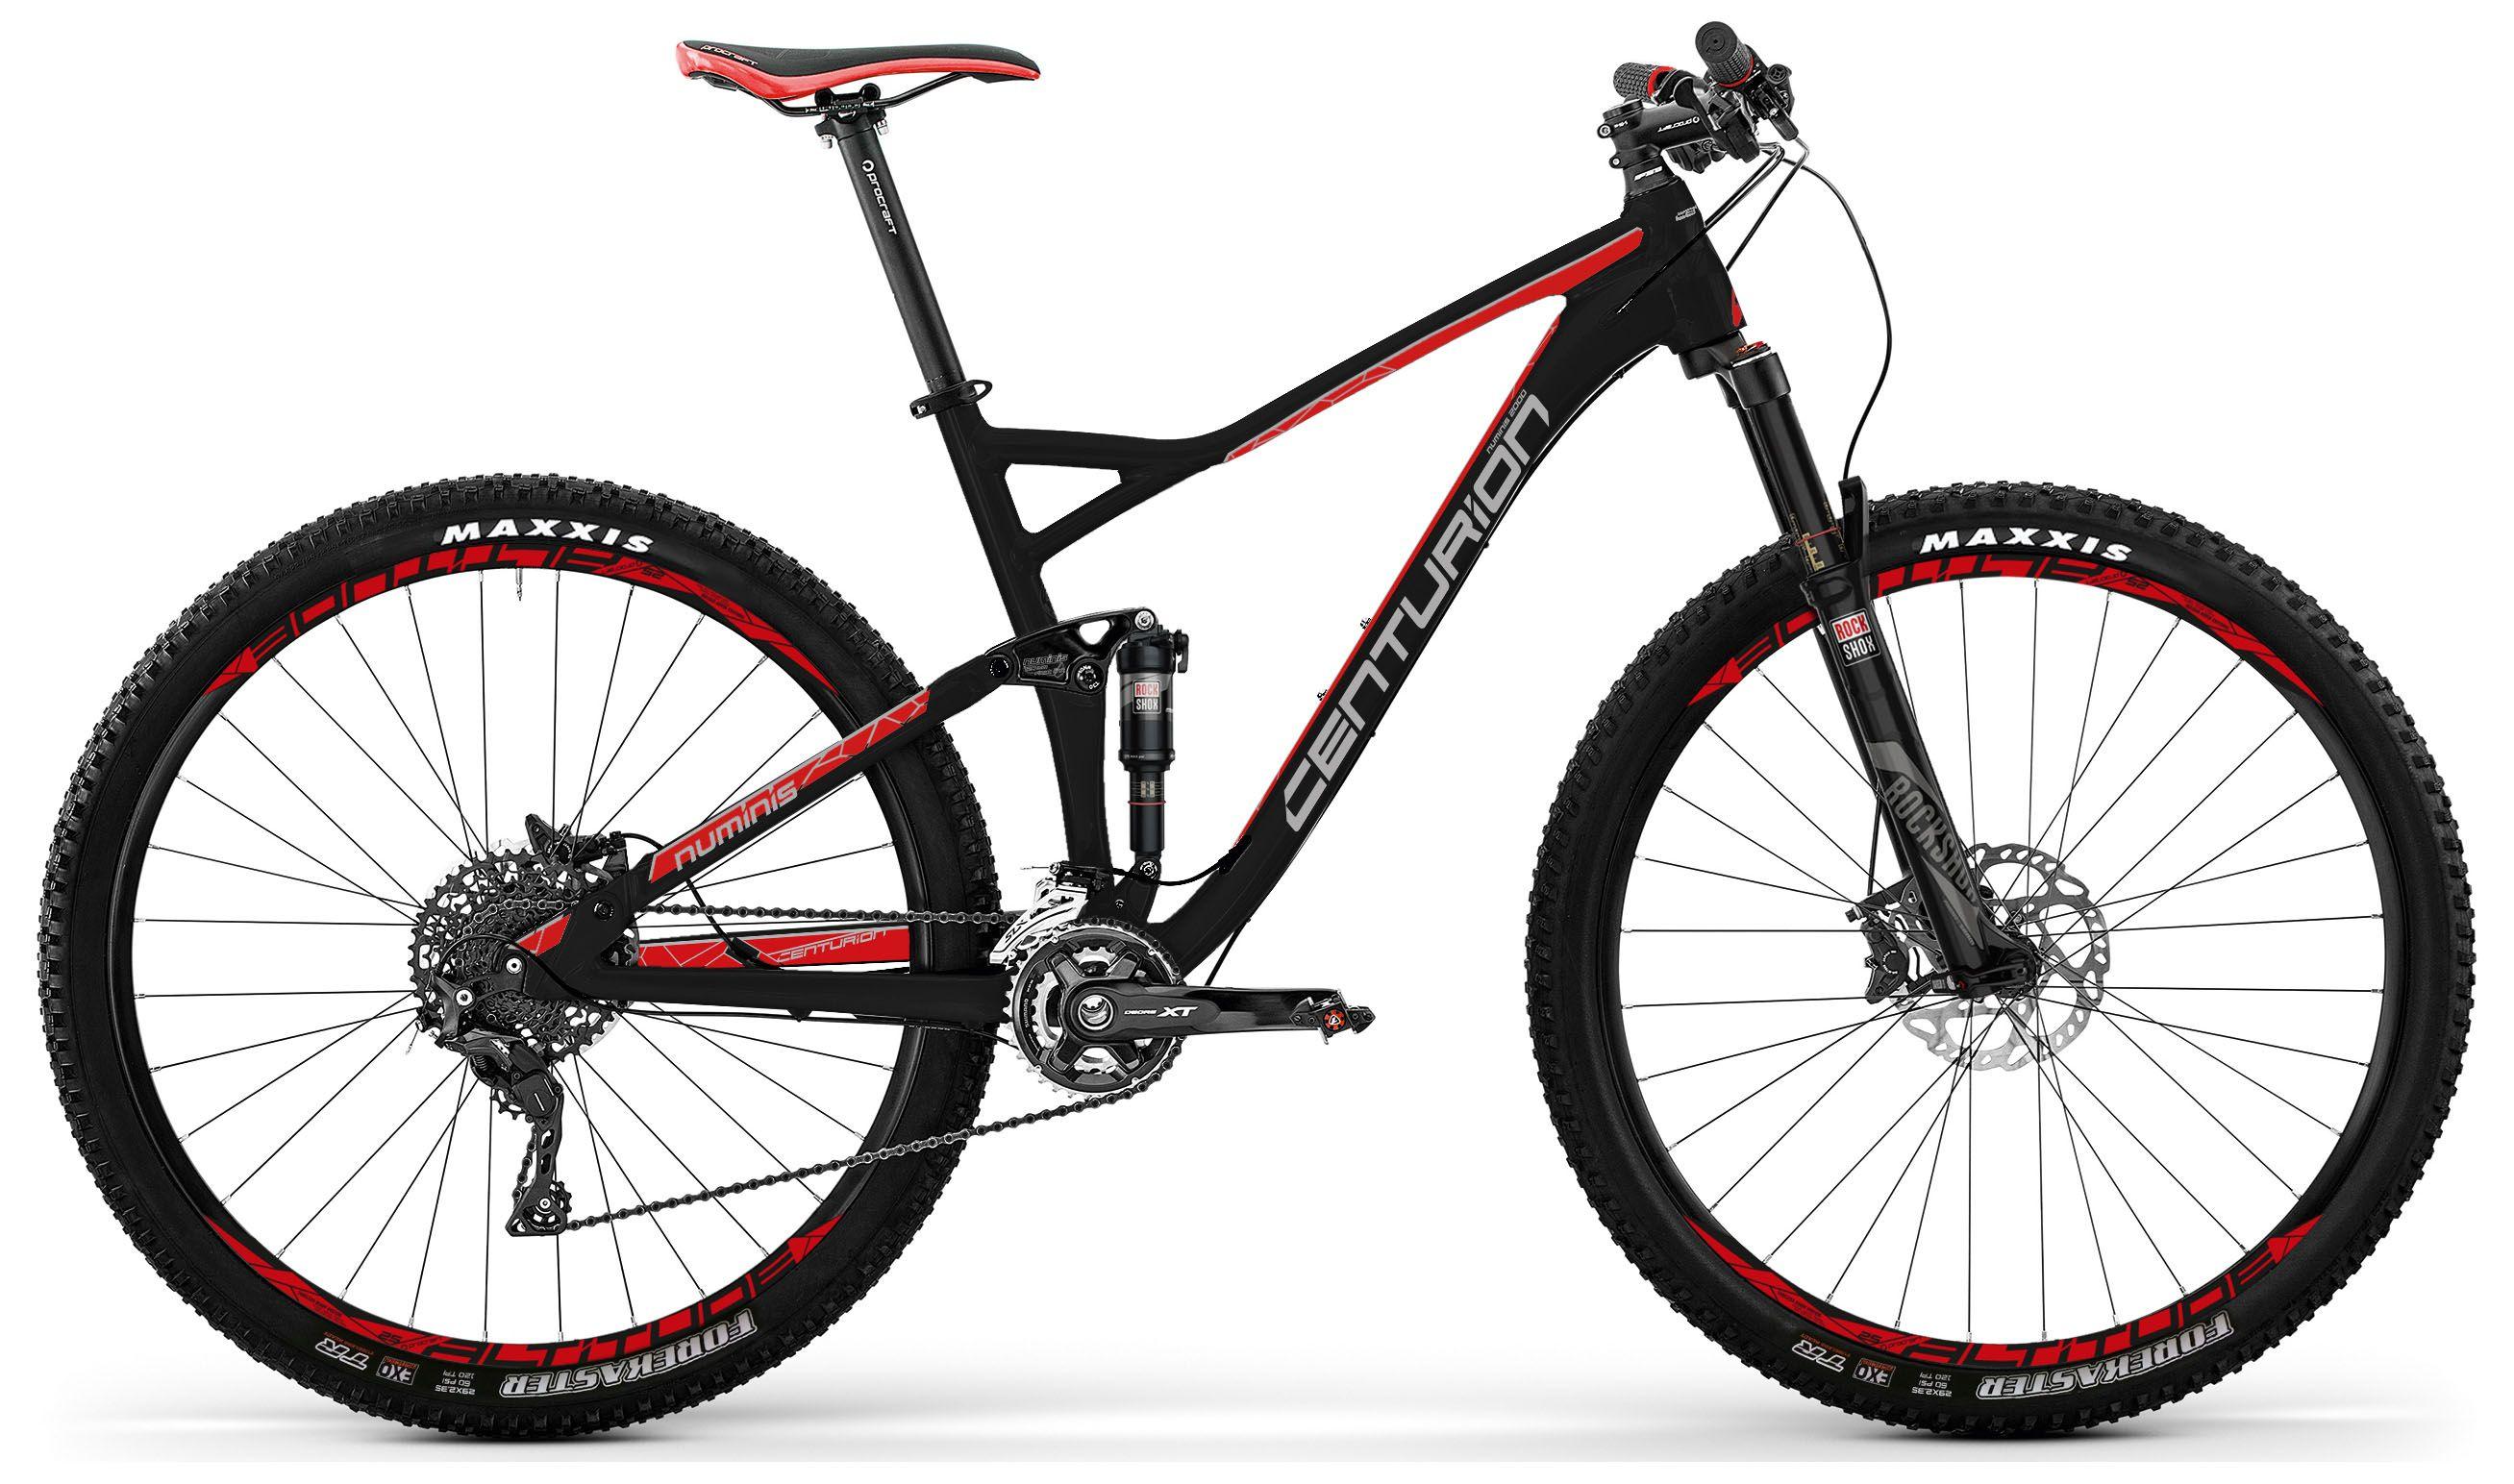 Велосипед Centurion Numinis 2000.27 2018 велосипед centurion e co 408 2016